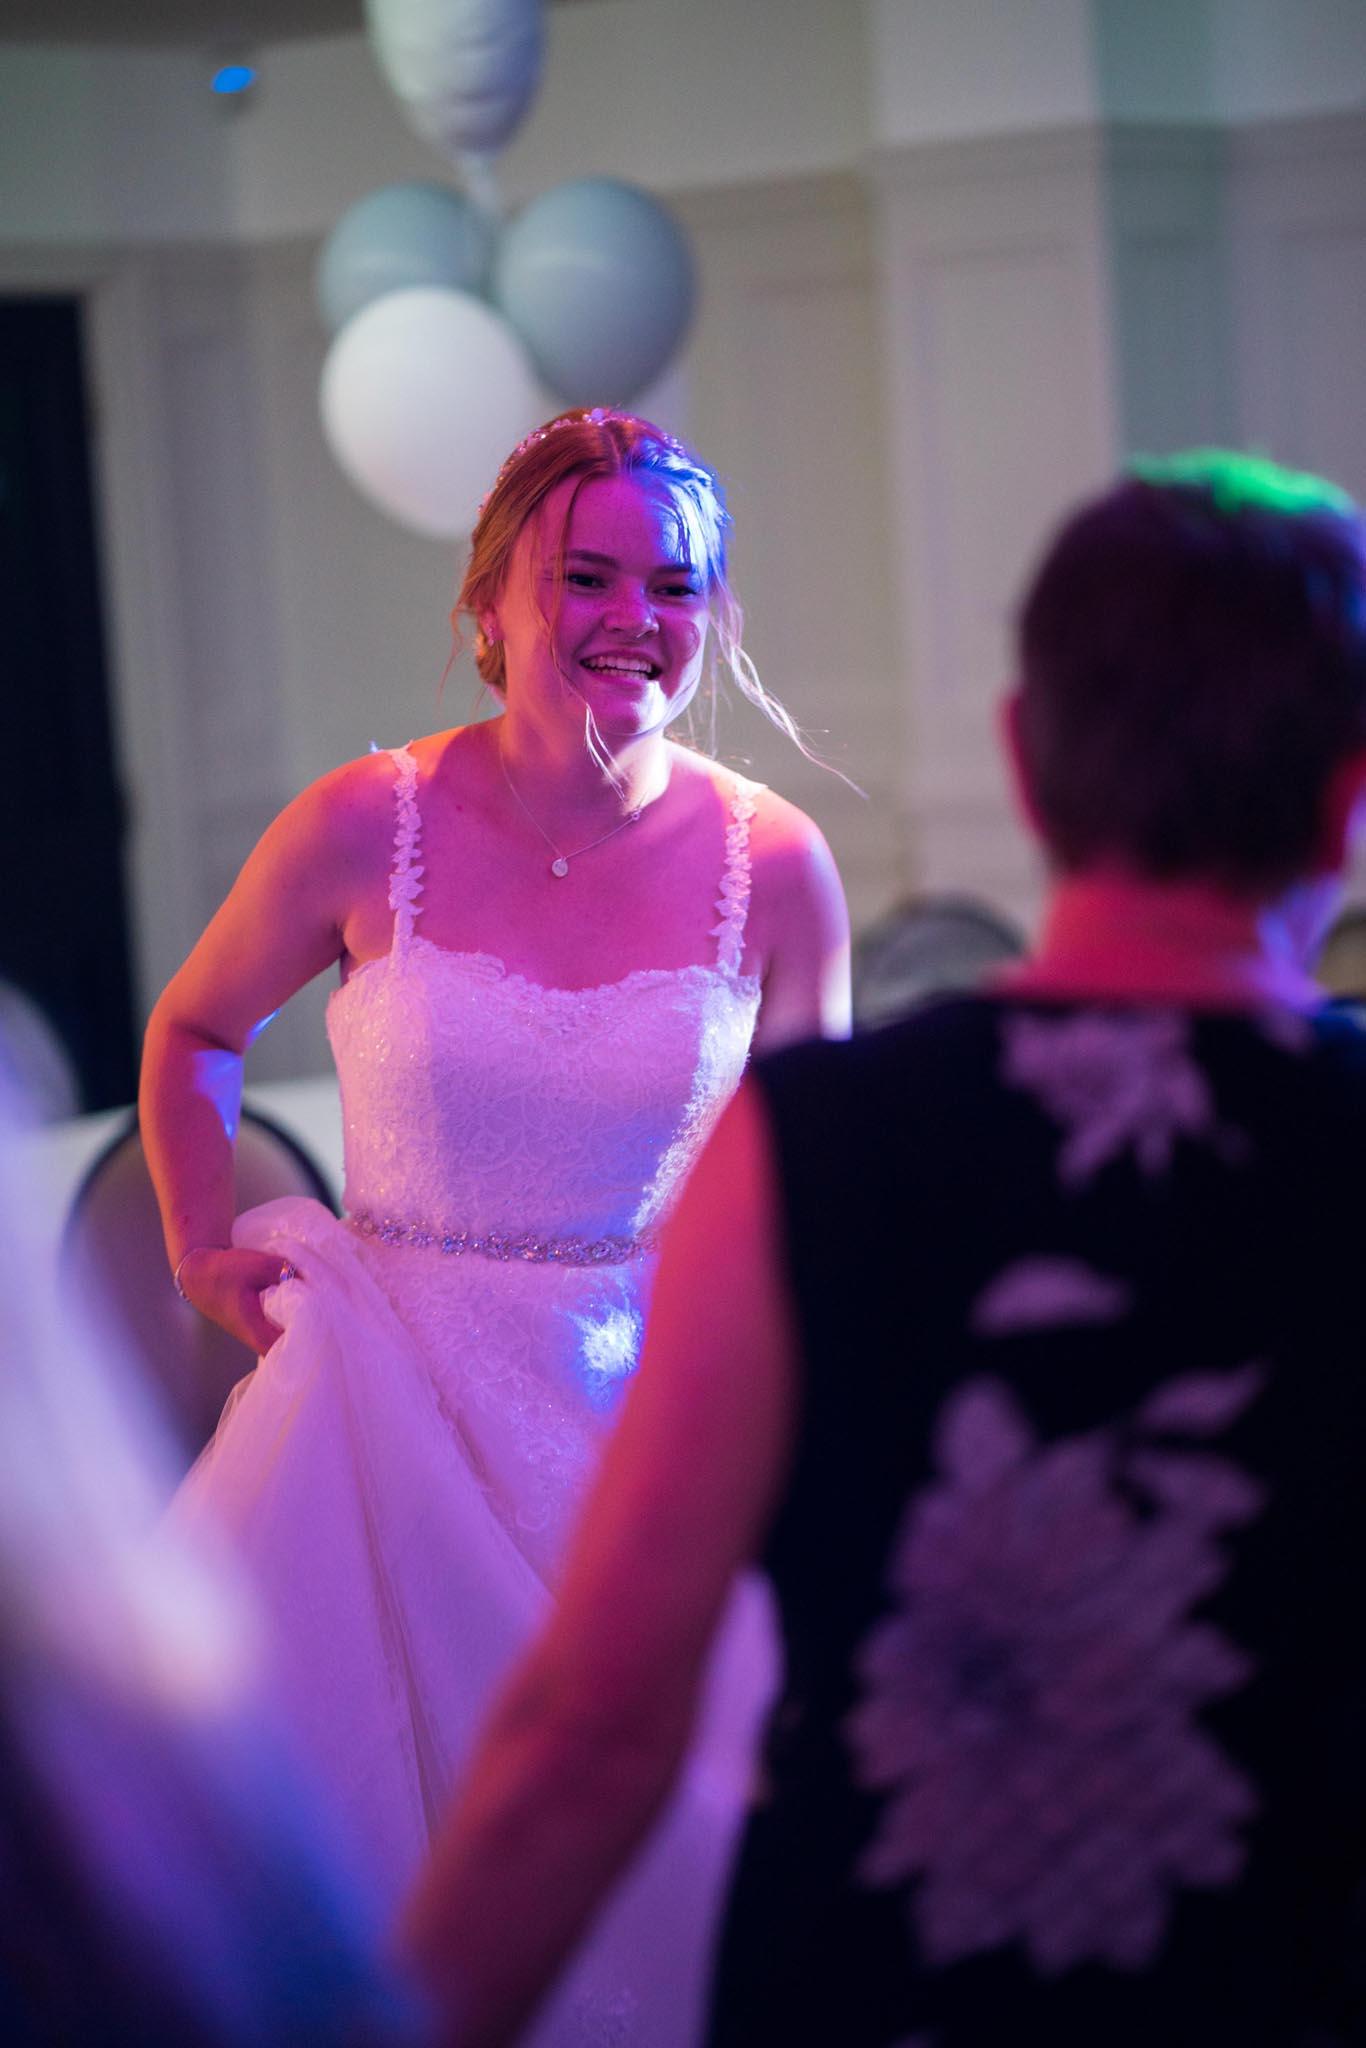 1044-Night-Reception-Luke-Yasmin-The-Rayleigh-Club-Wedding-Photography.jpg